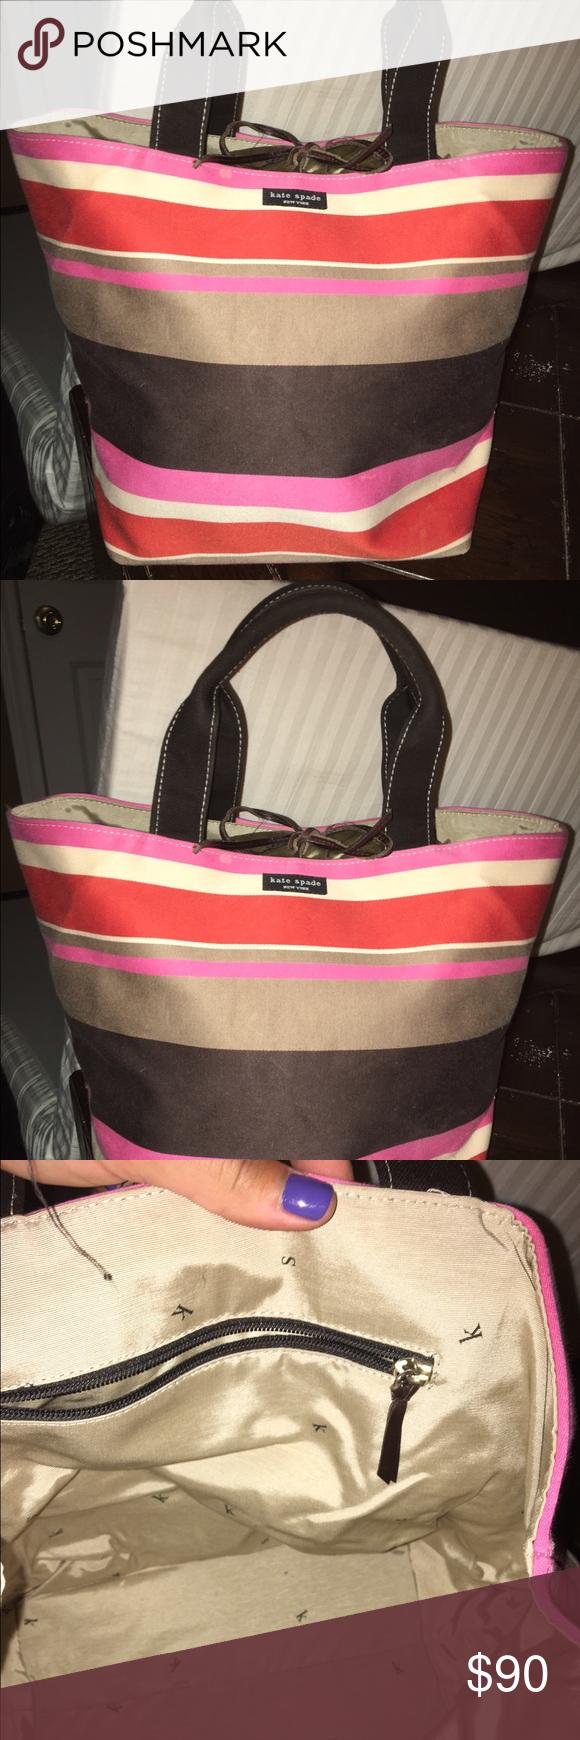 Kate Spade Bag Vintage striped Kate Spade bucket bag. Great condition! kate spade Bags Shoulder Bags